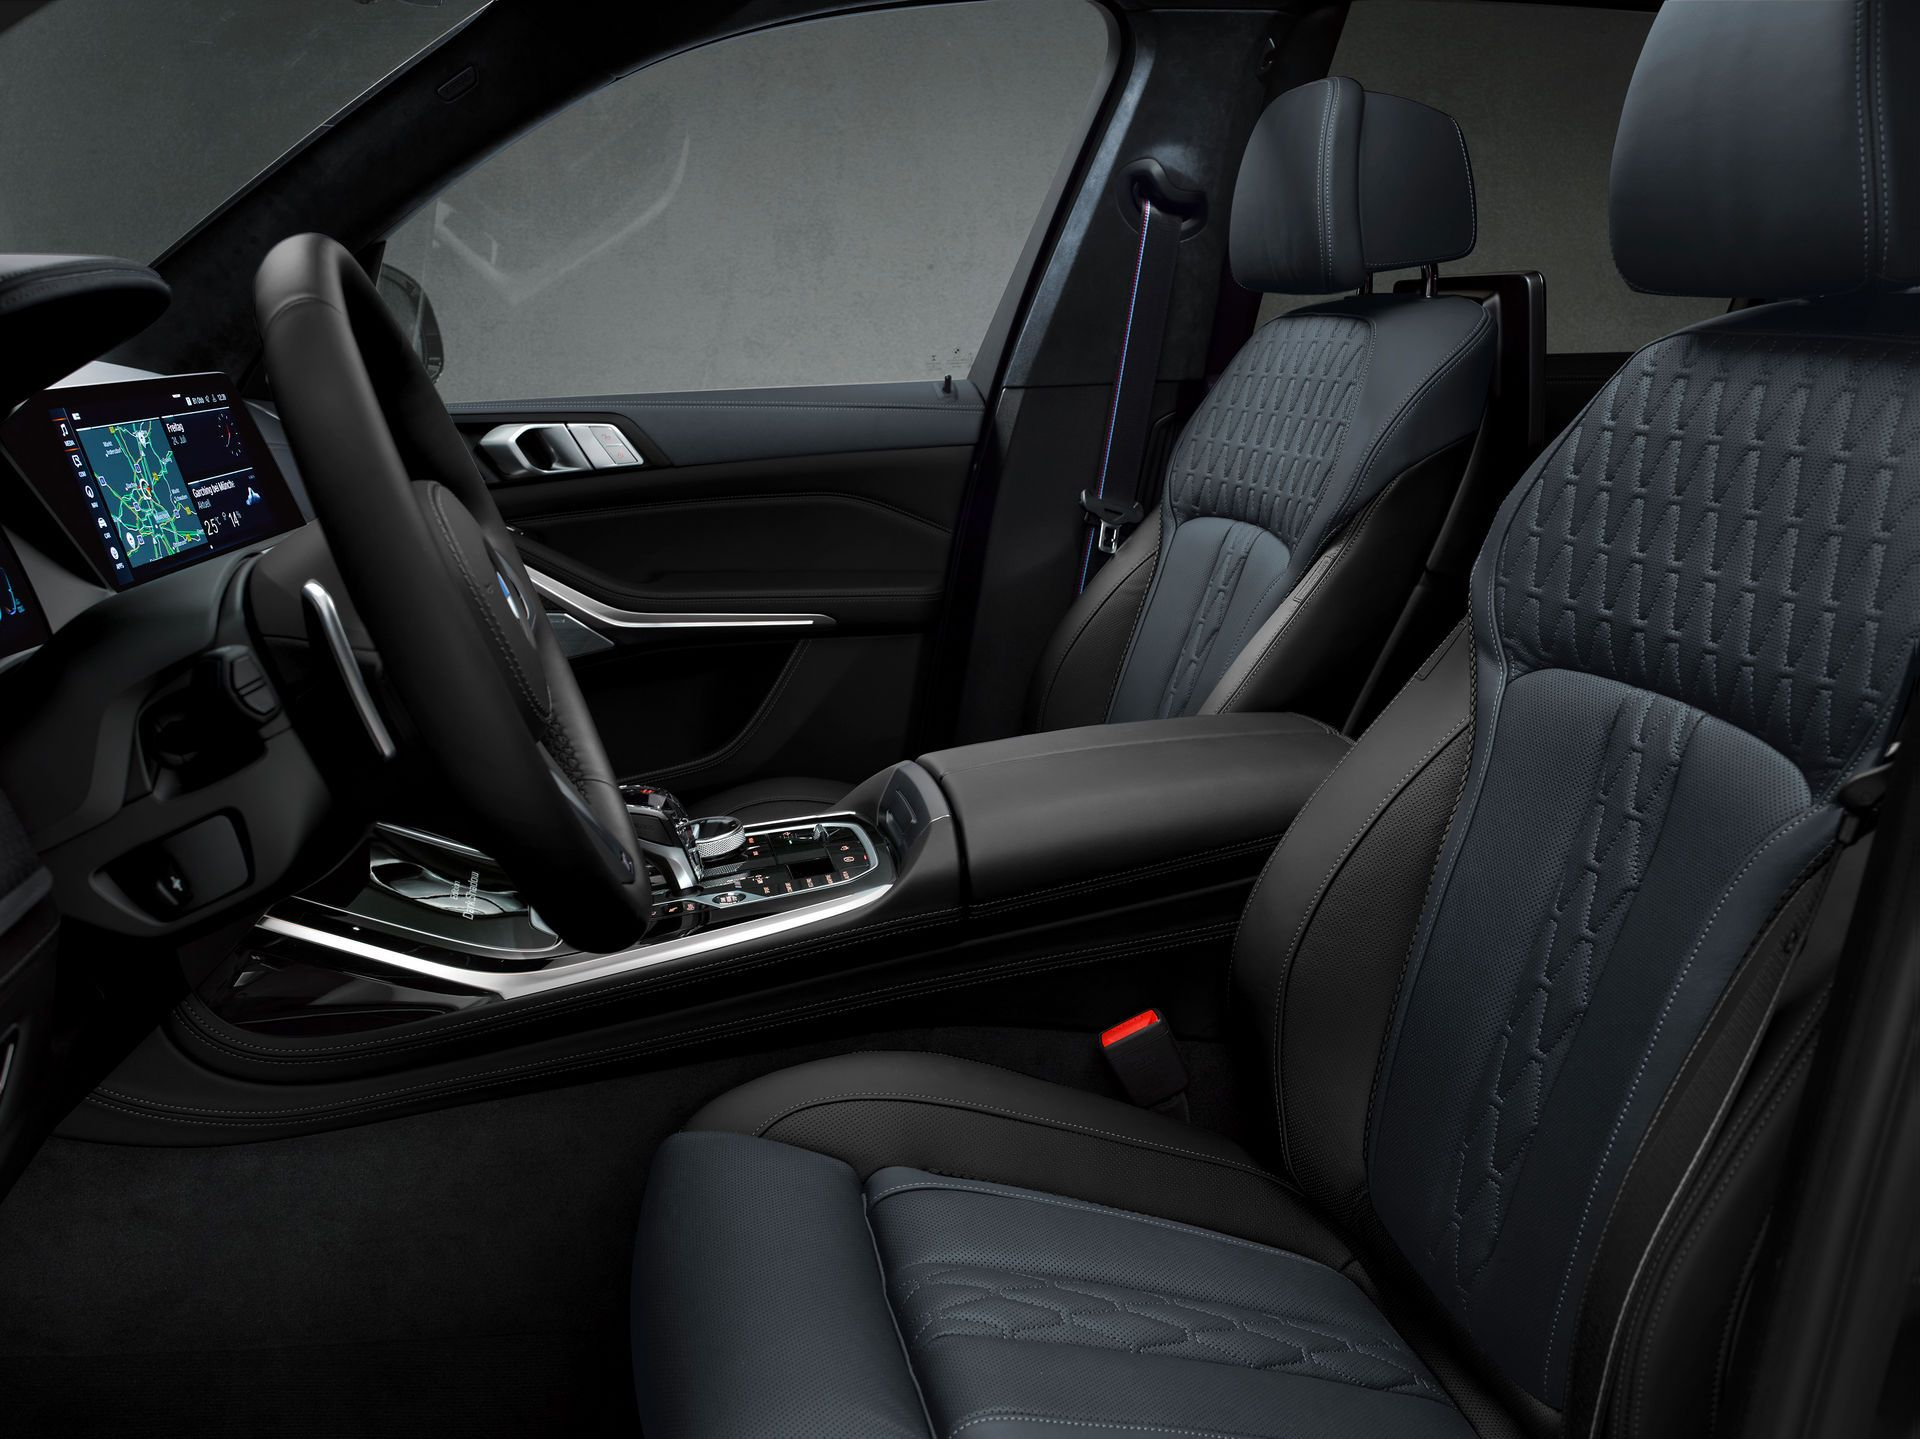 BMW-X7-Dark-Shadow-Edition-16